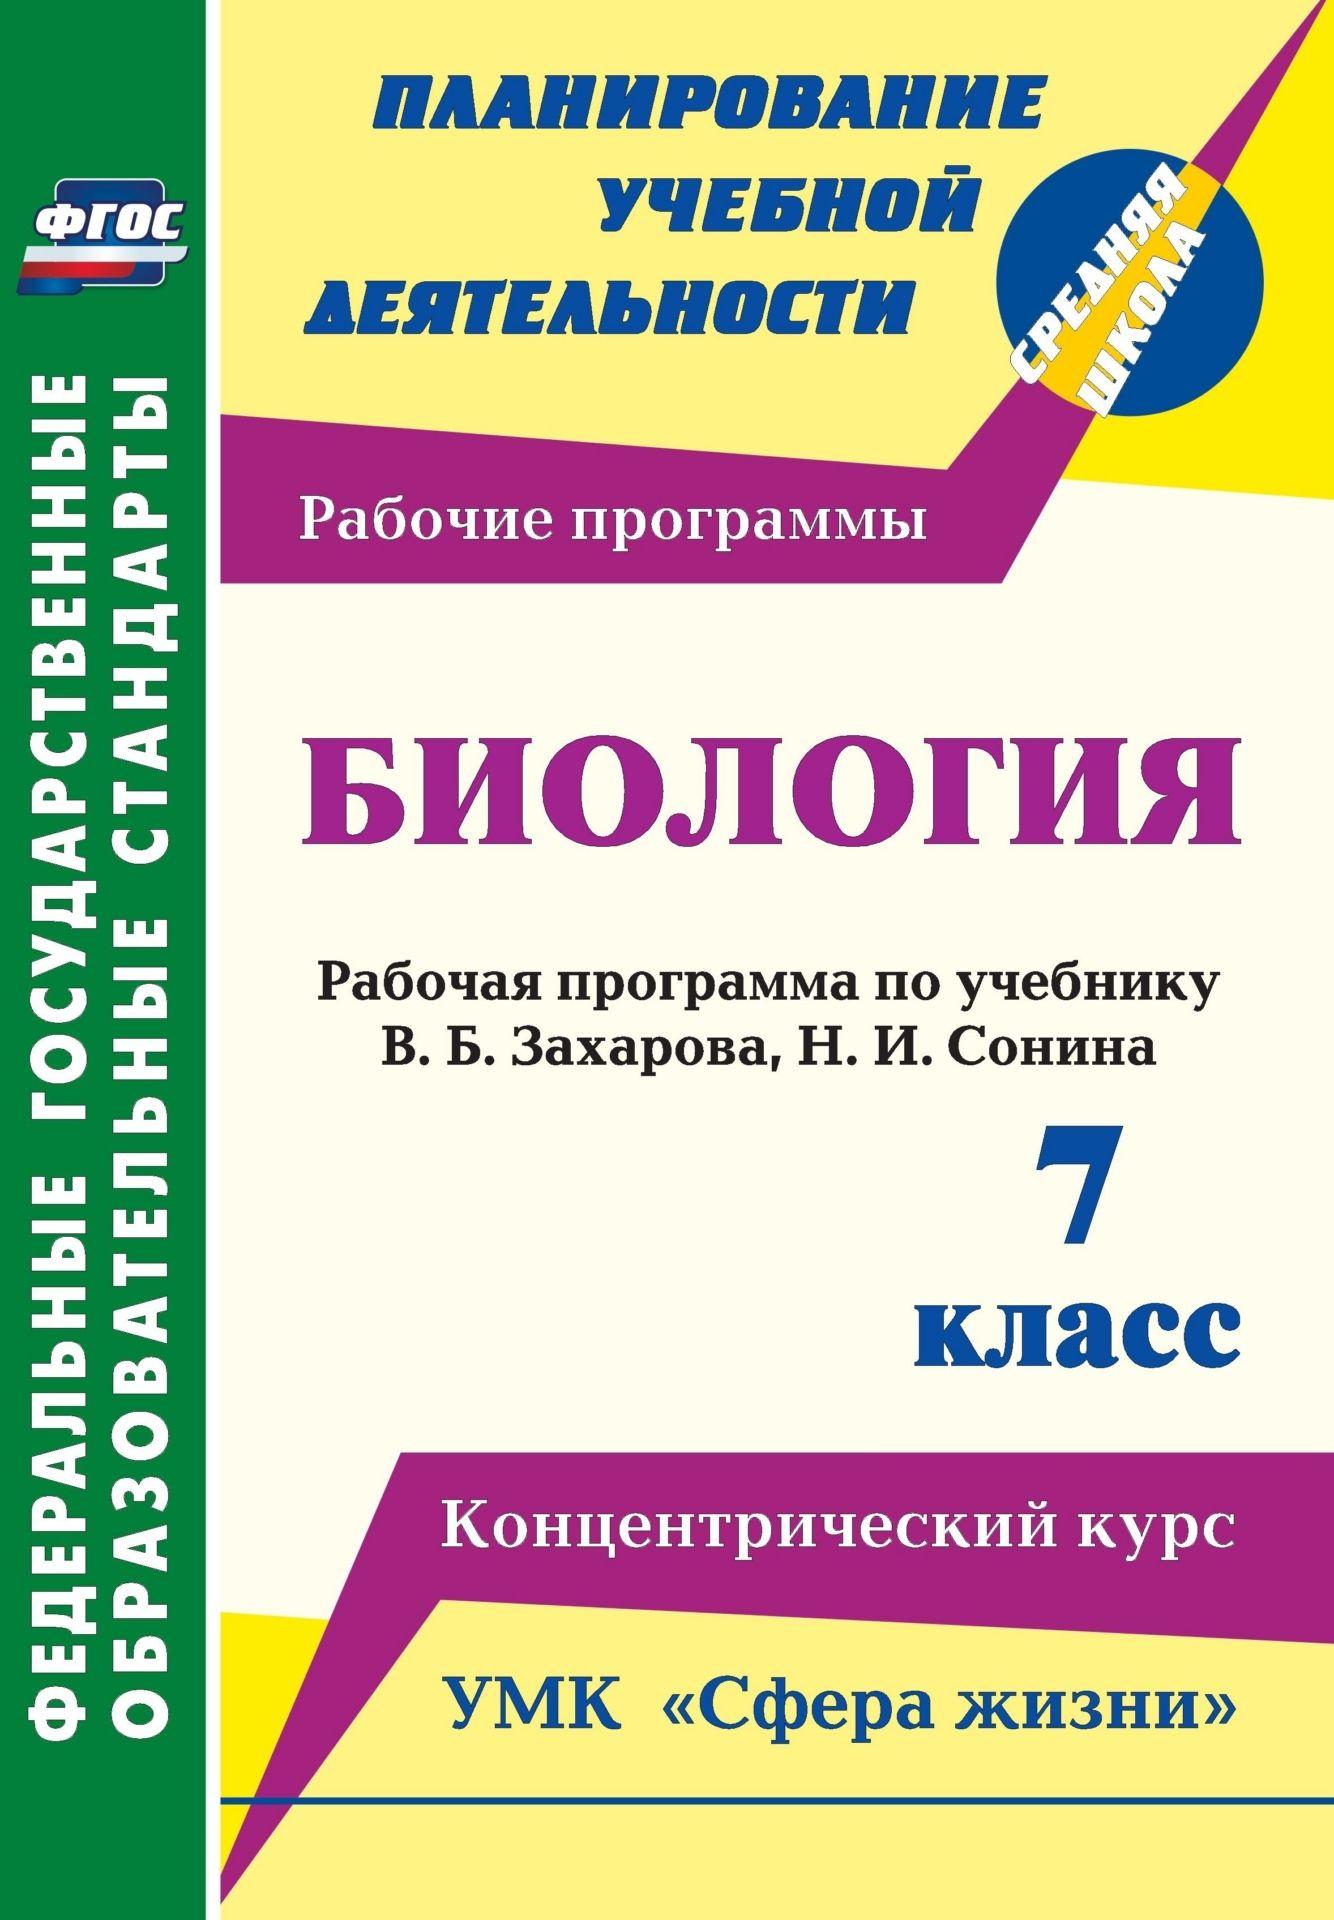 И. В. Константинова Биология. 7 класс.. Рабочая программа по учебнику В. Б. Захарова, Н. И. Сонина